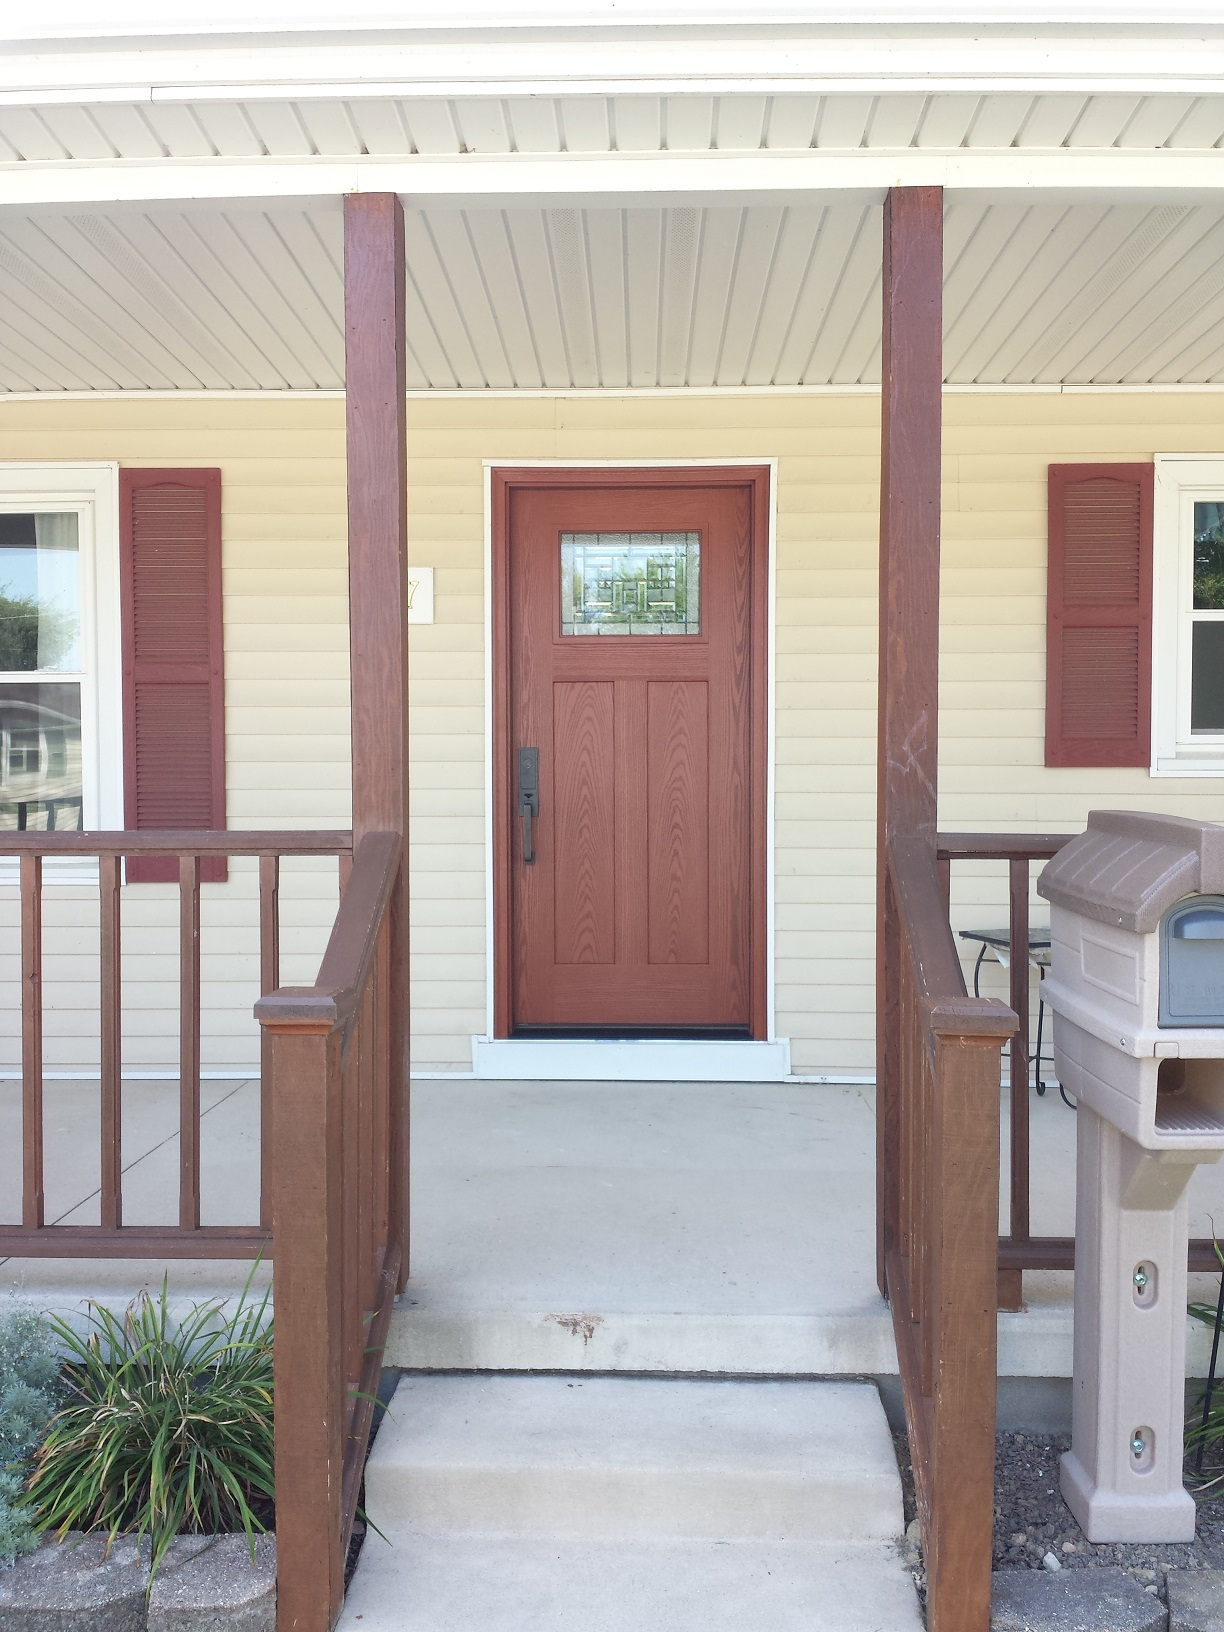 RESIDENTIAL ENTRY DOORS  Dennys Door Company in Celina Ohio